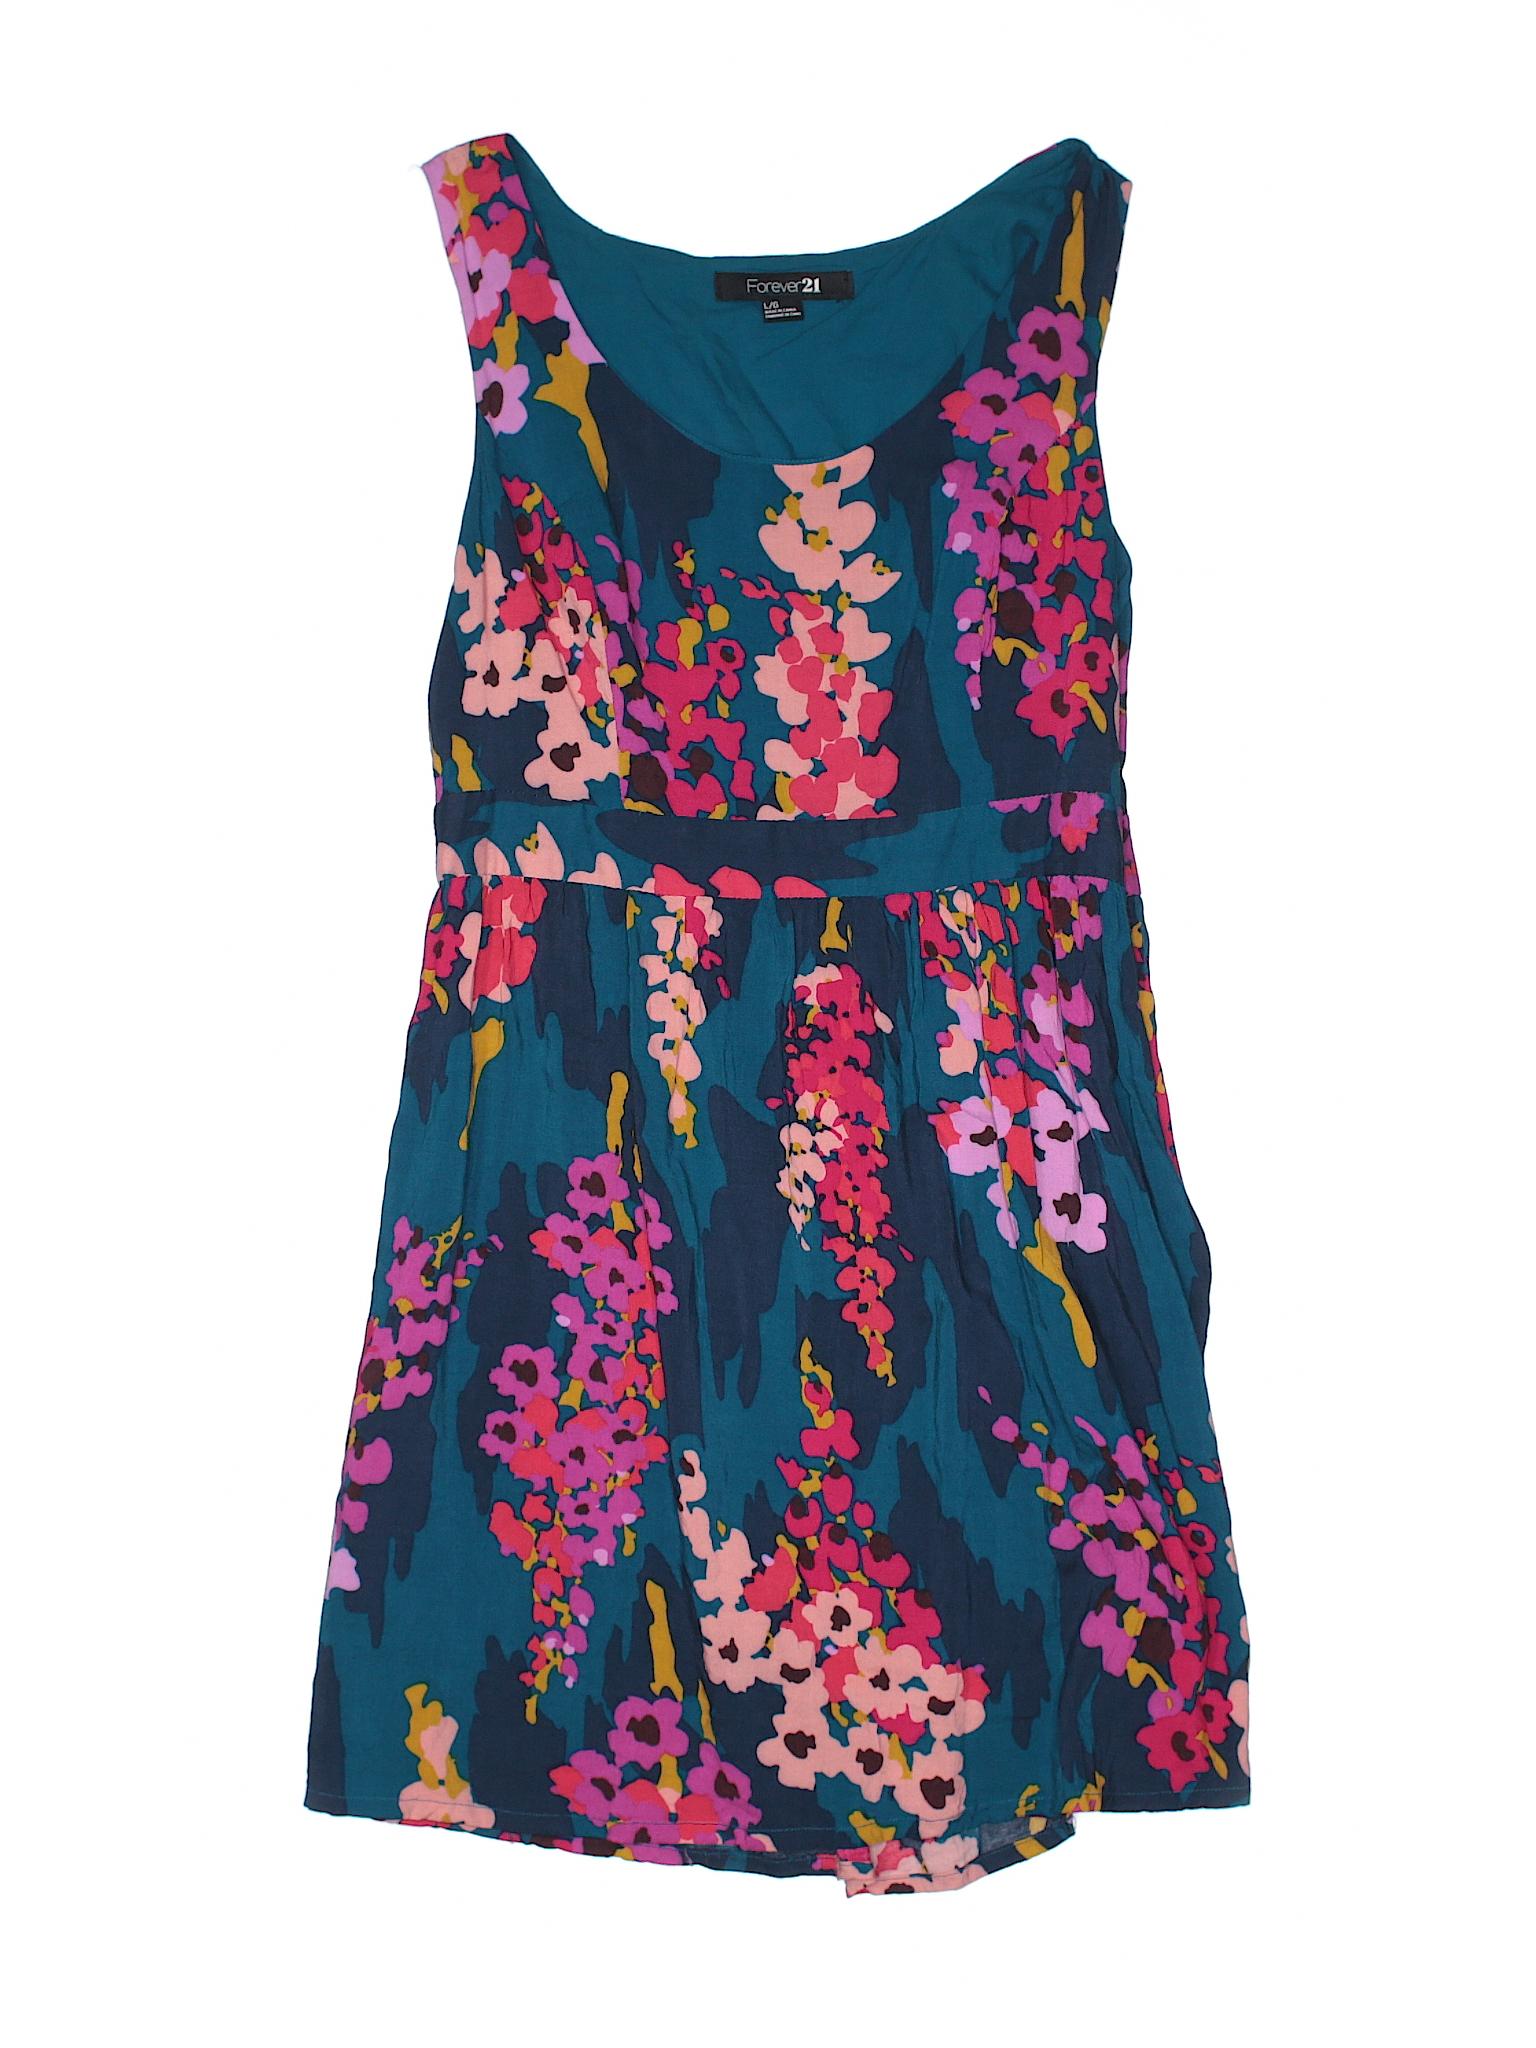 Forever Casual 21 Forever Casual Dress Forever 21 Selling 21 Selling Casual Dress Selling zwnvxFqH5